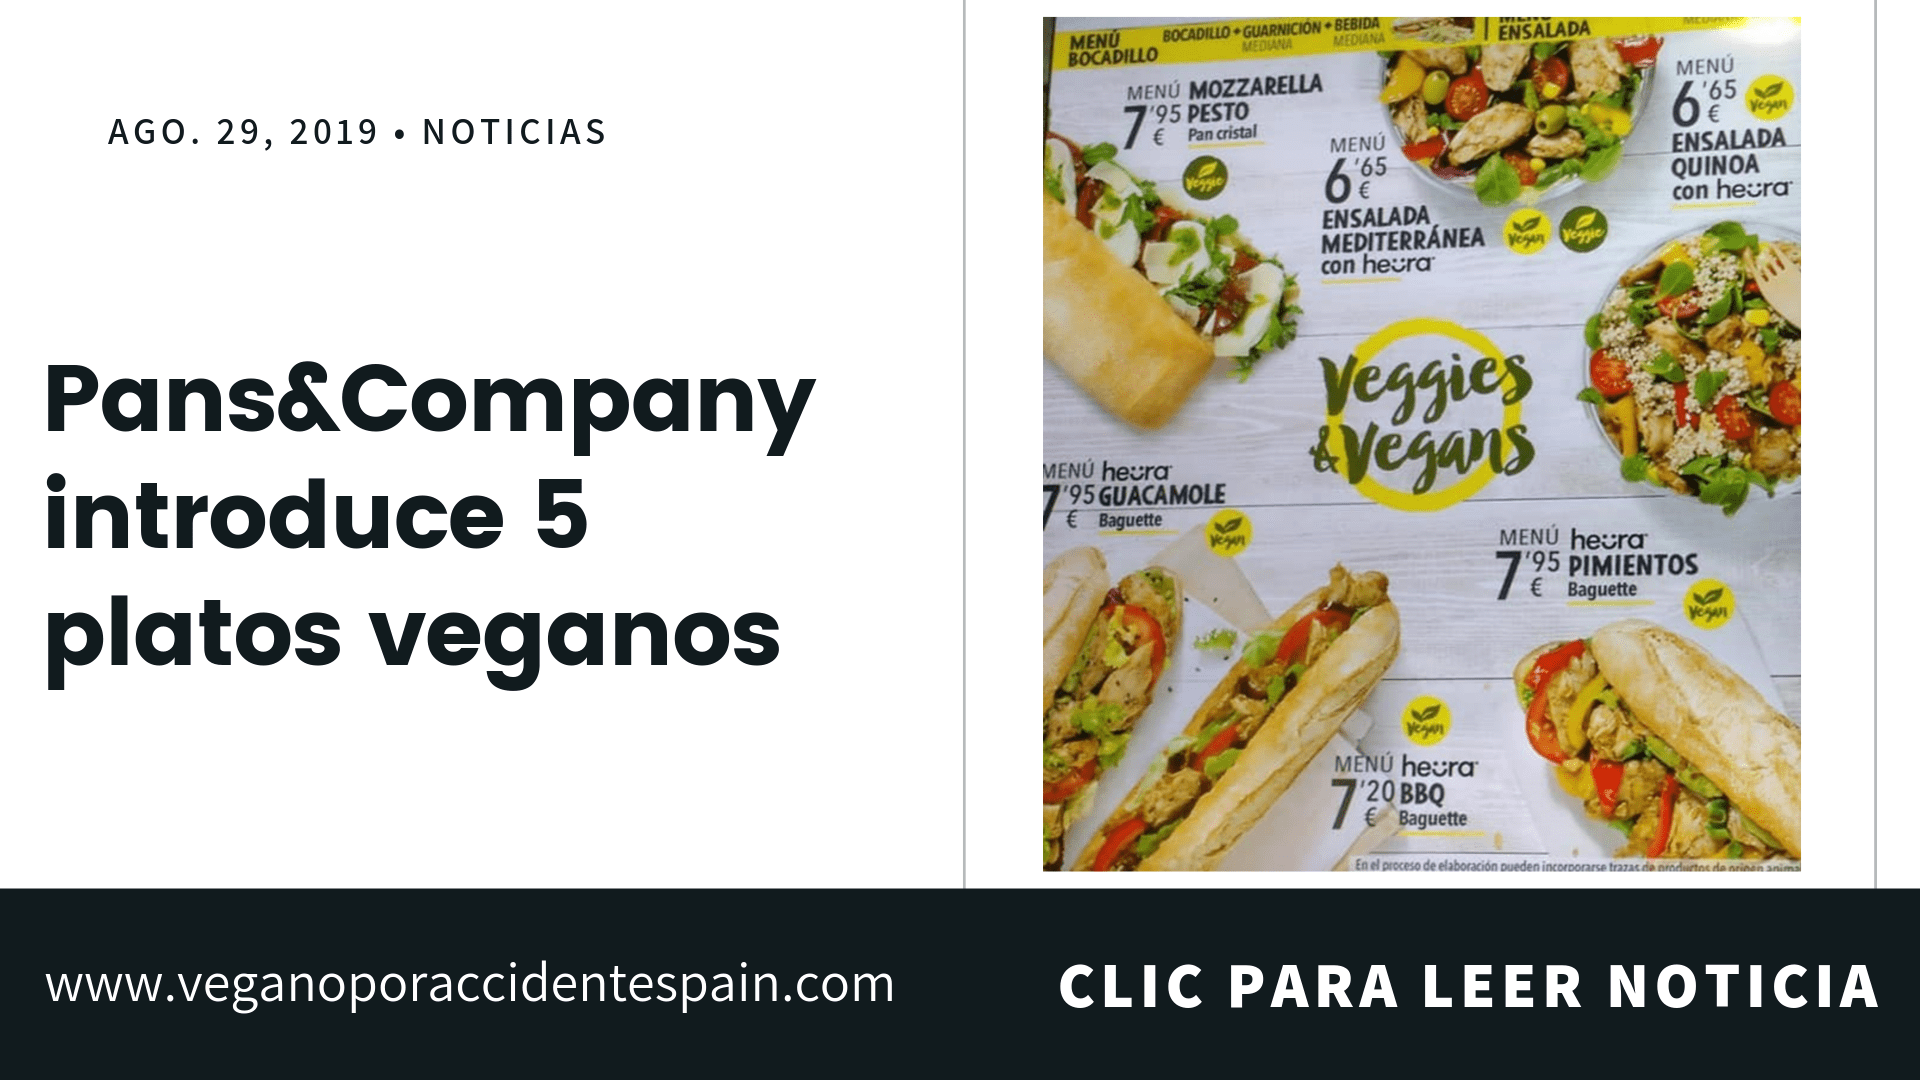 platos veganos pans&company